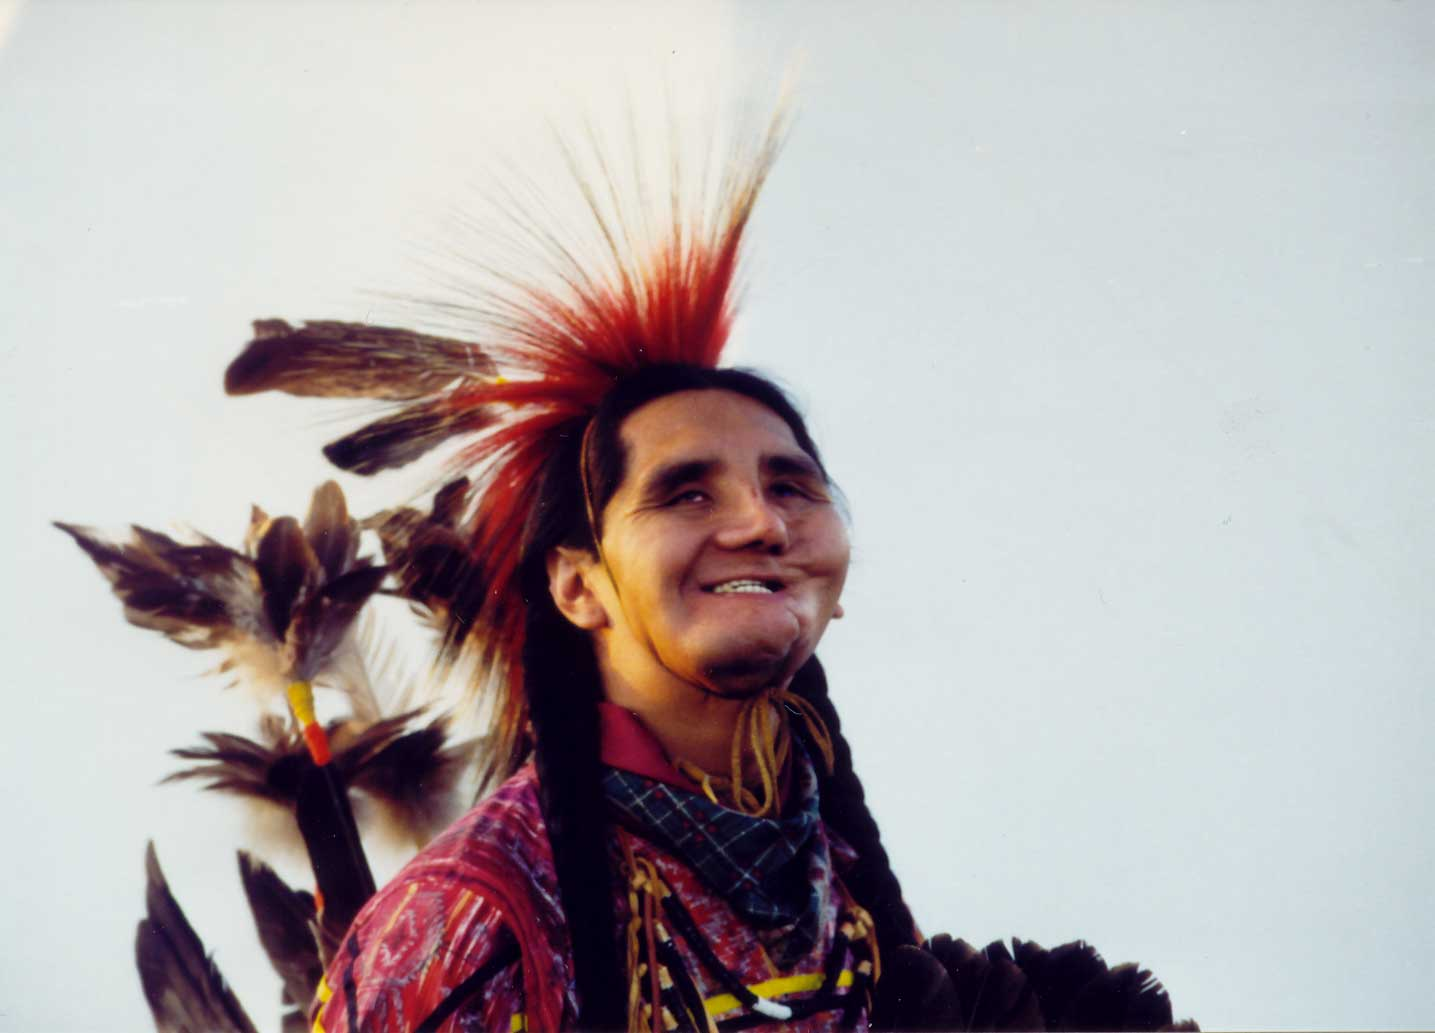 Arnold W. Thomas in native dress.Photo from WhiteBuffaloKnife.com